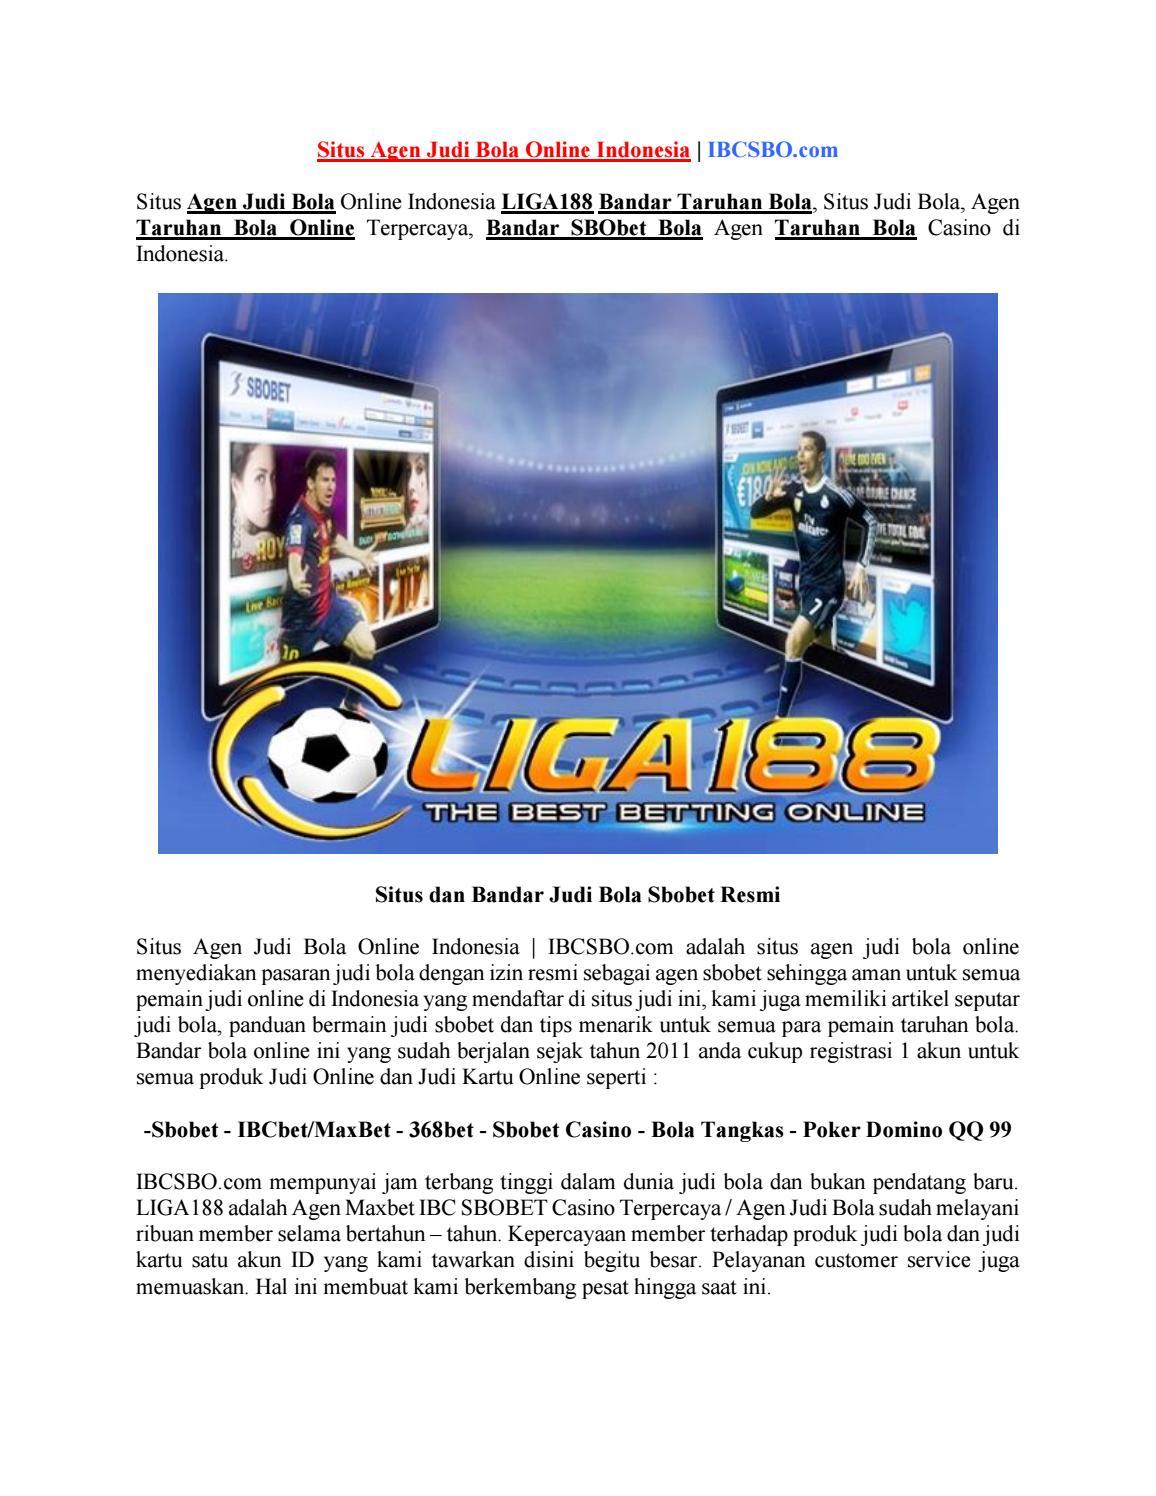 Situs Agen Judi Bola Online Indonesia Ibcsbo Com By Poker Domino 99 Issuu